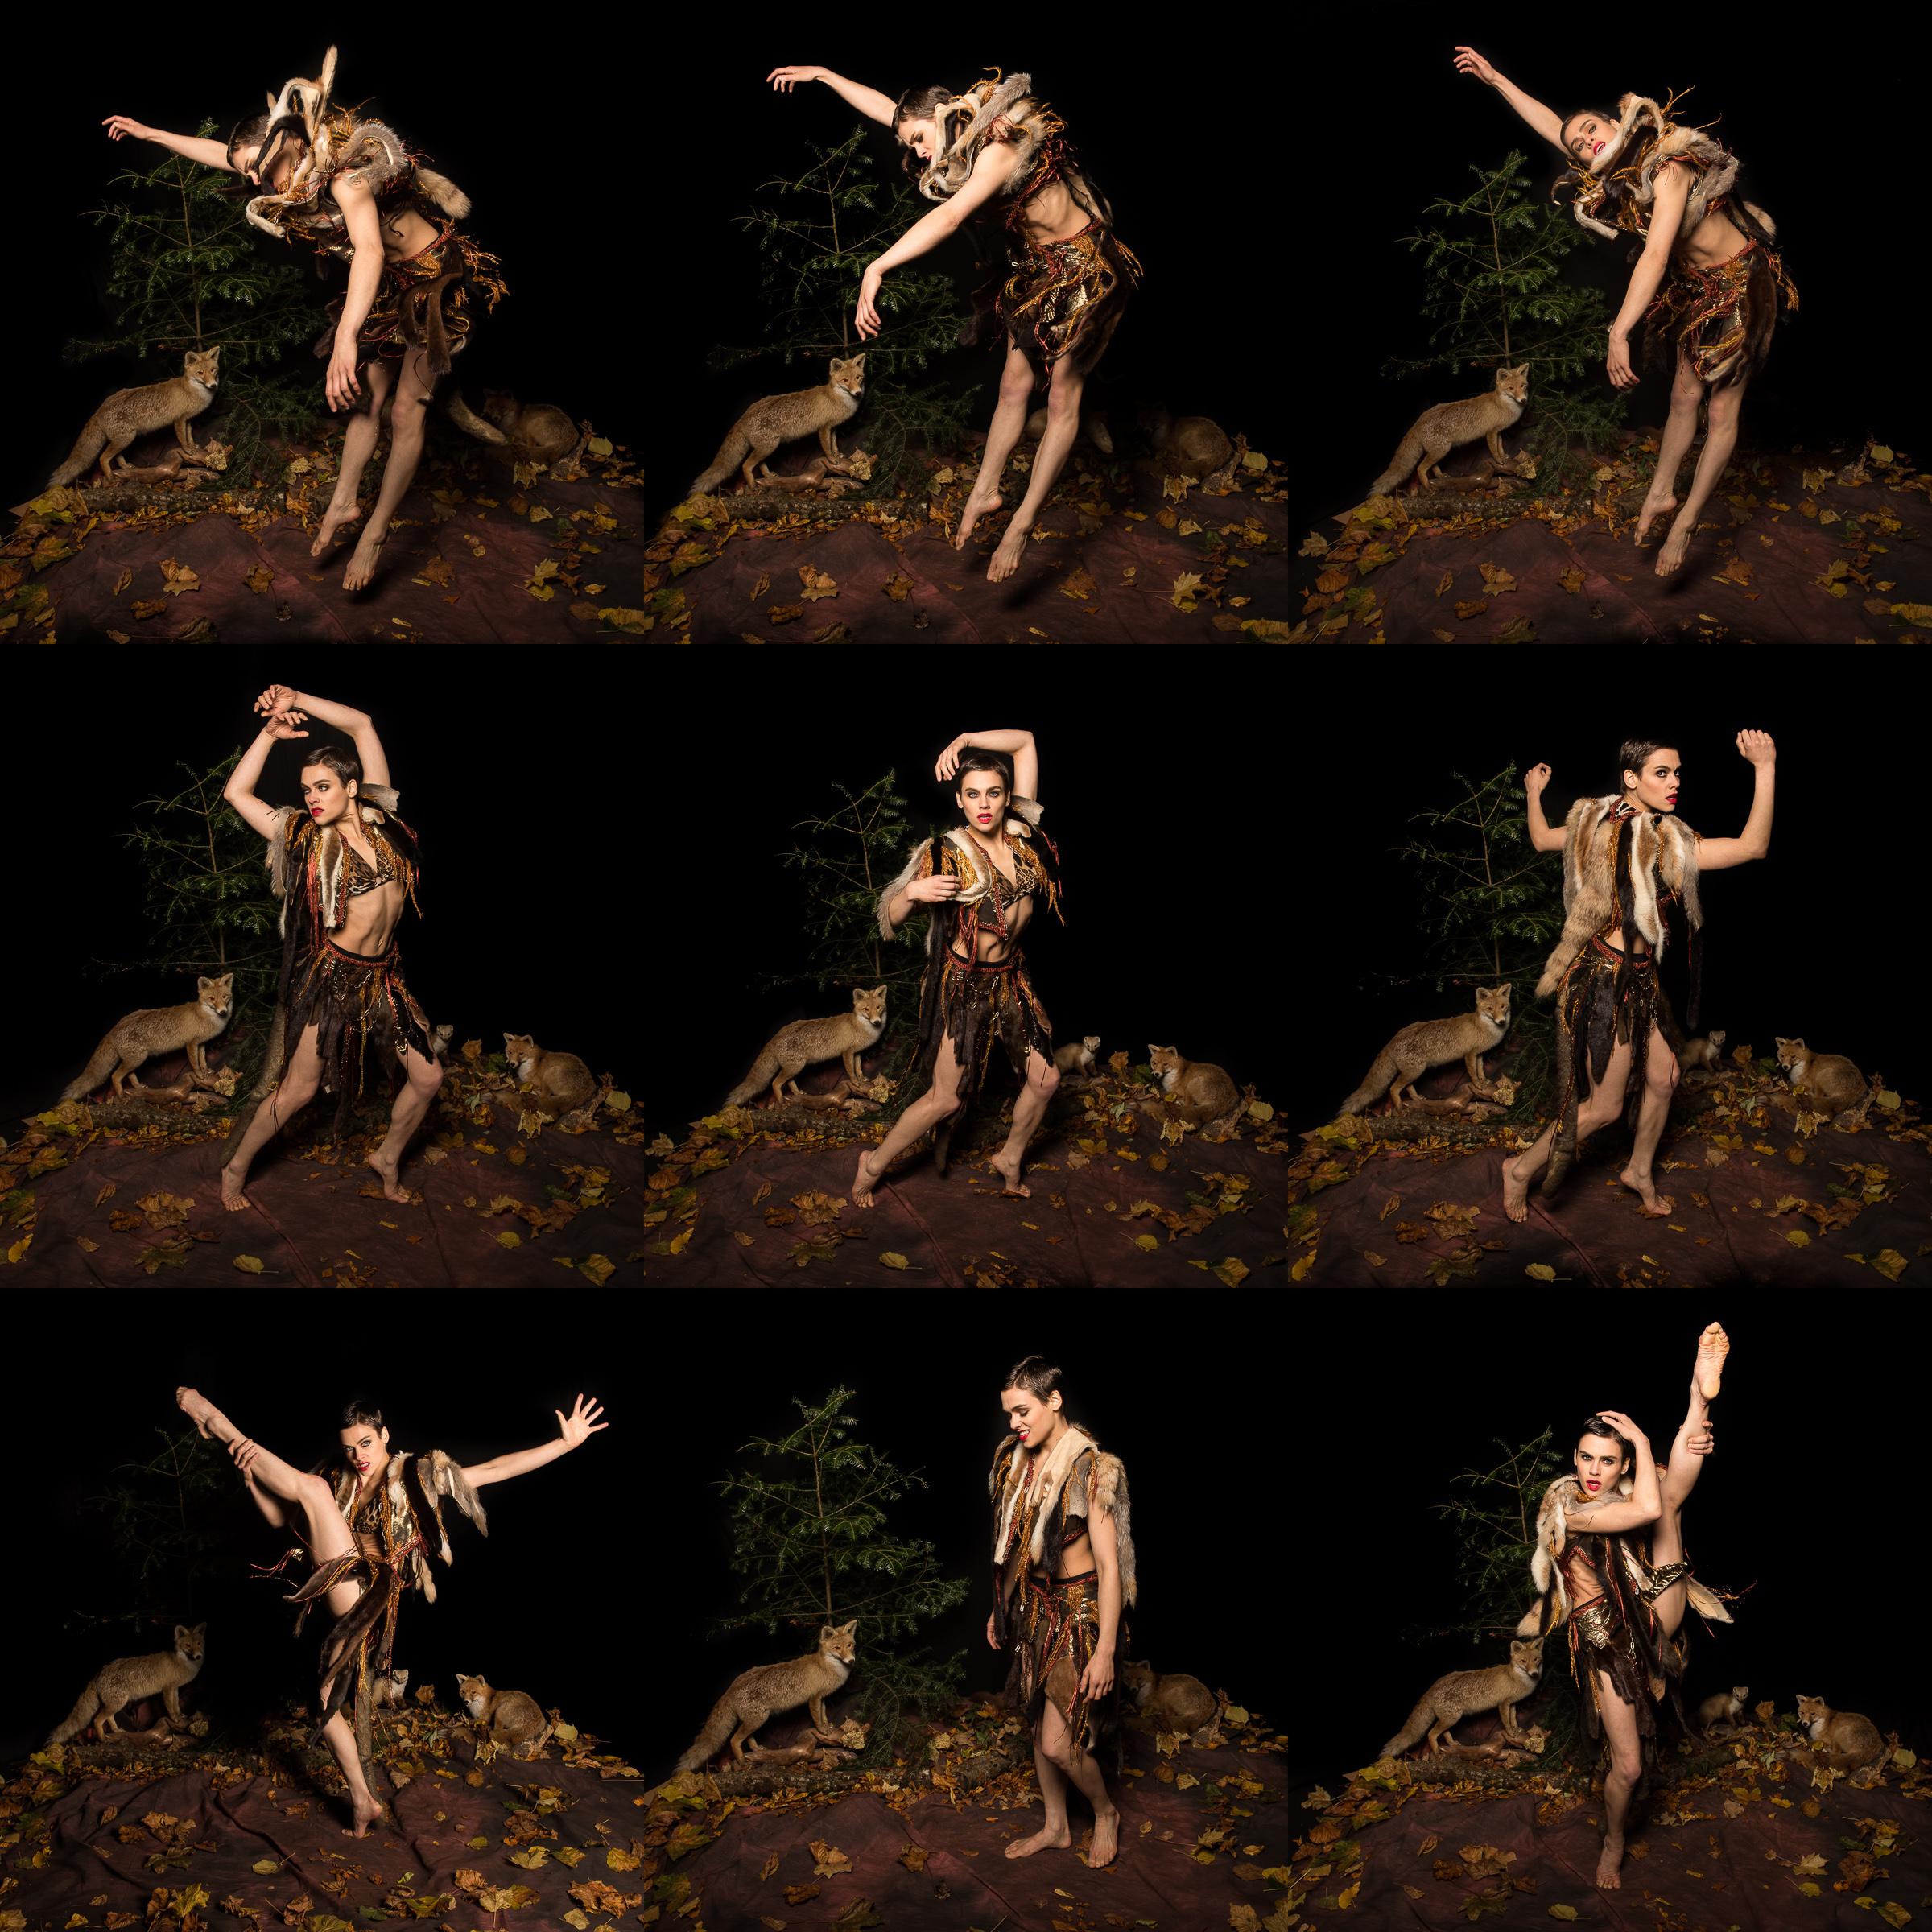 Nina Burri Foxy Lady Shoot @ CHAMBRE NOIRE Studio, Fribourg, 30.10.2013